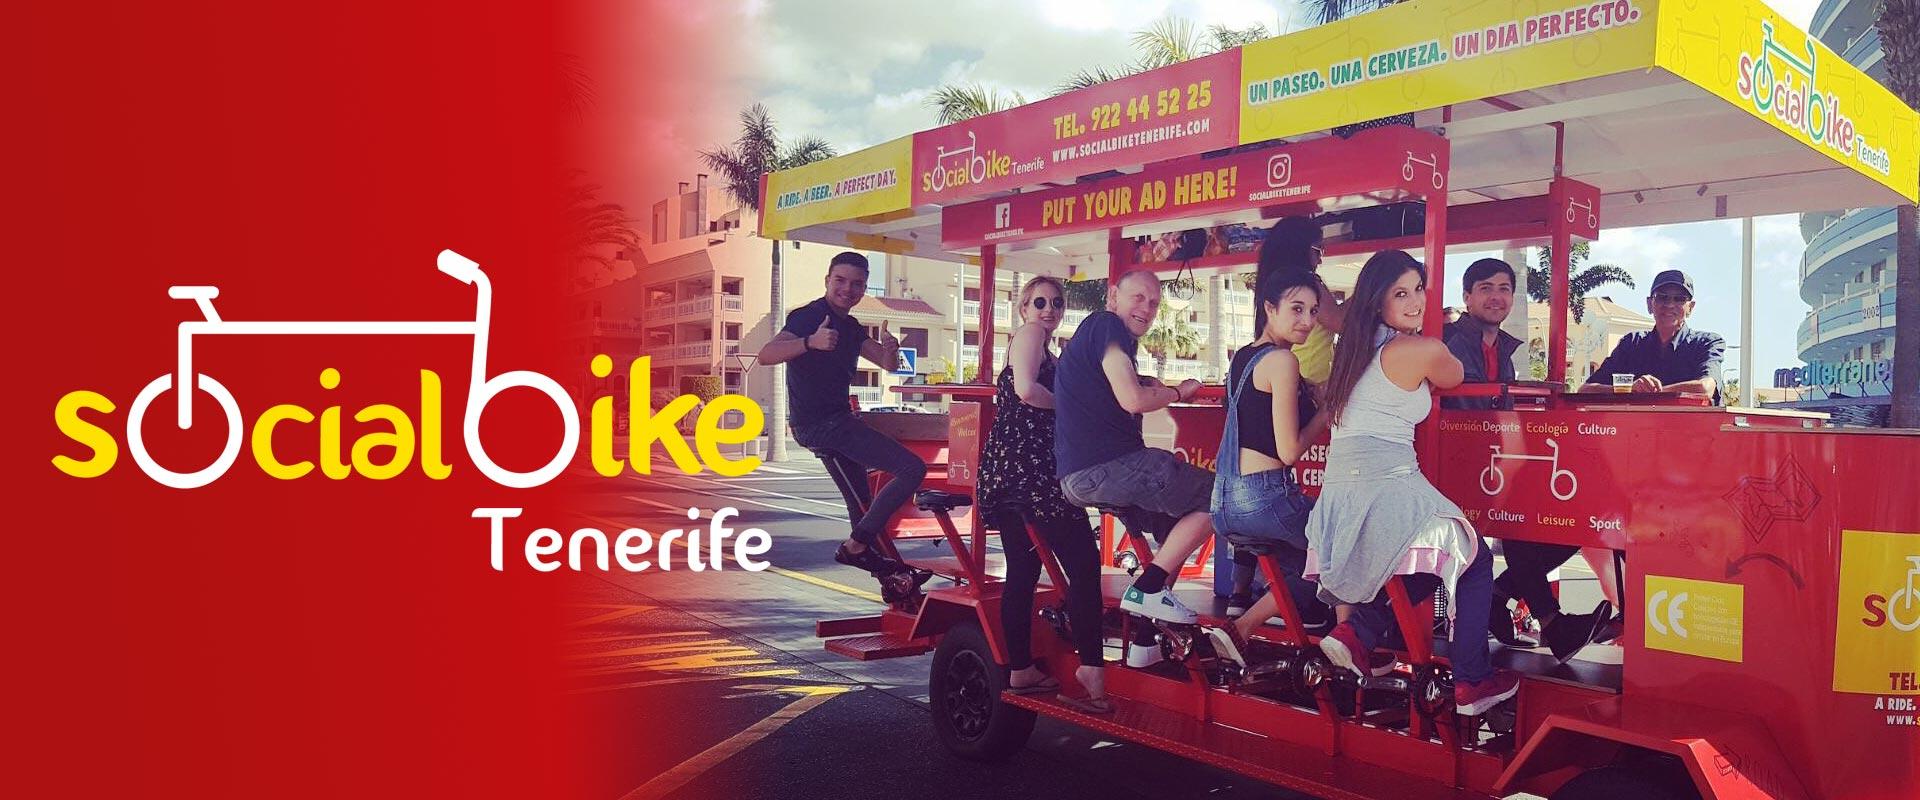 Bienvenidos a Social Bike Tenerife